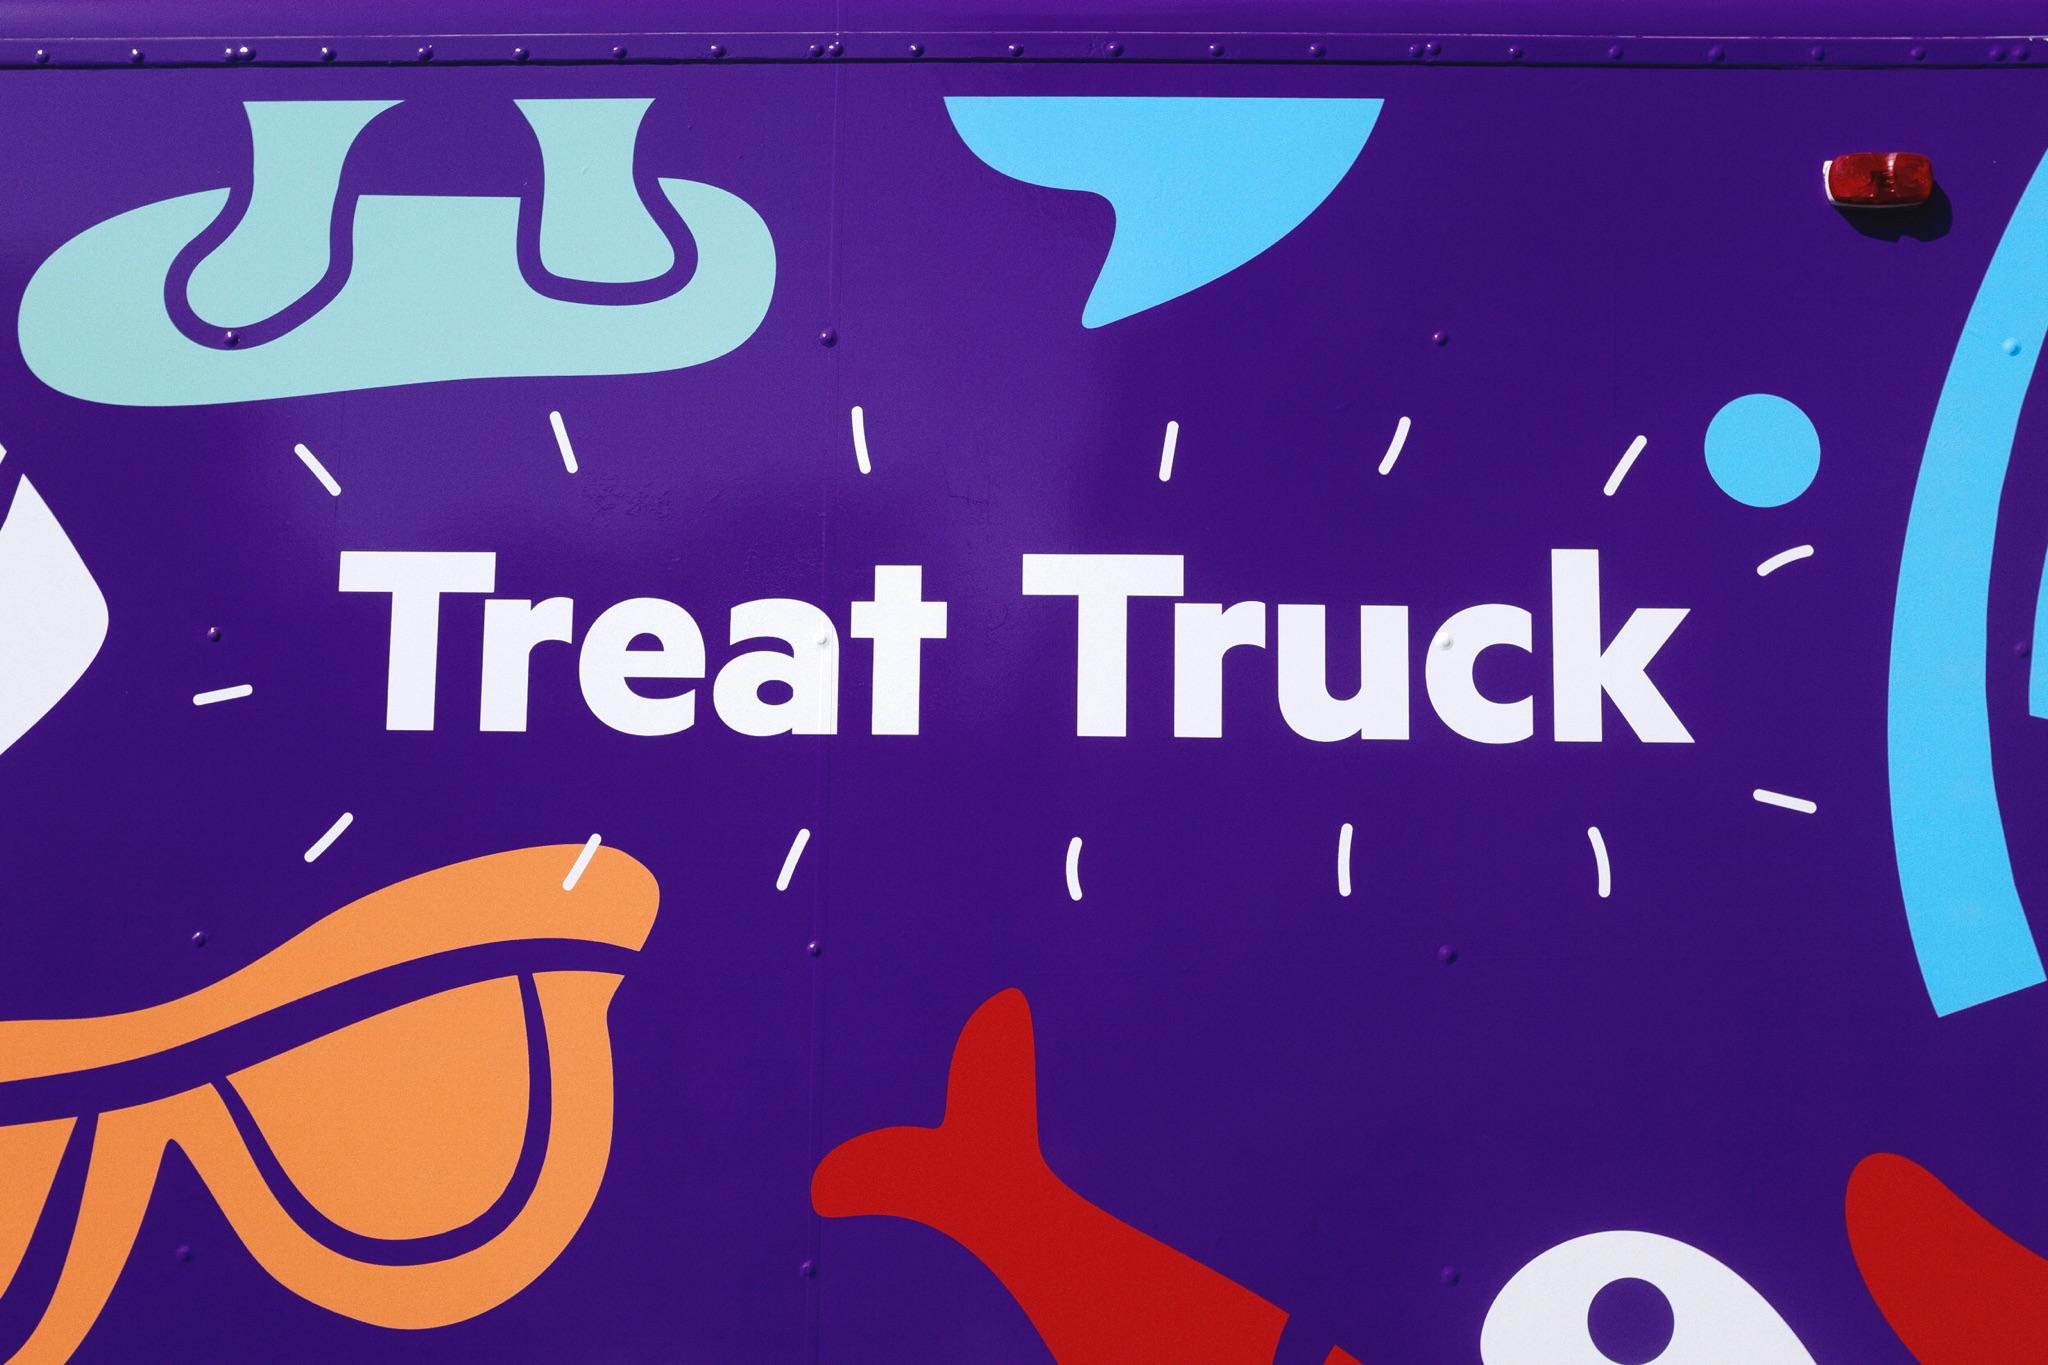 HCH treat Truck5.jpg